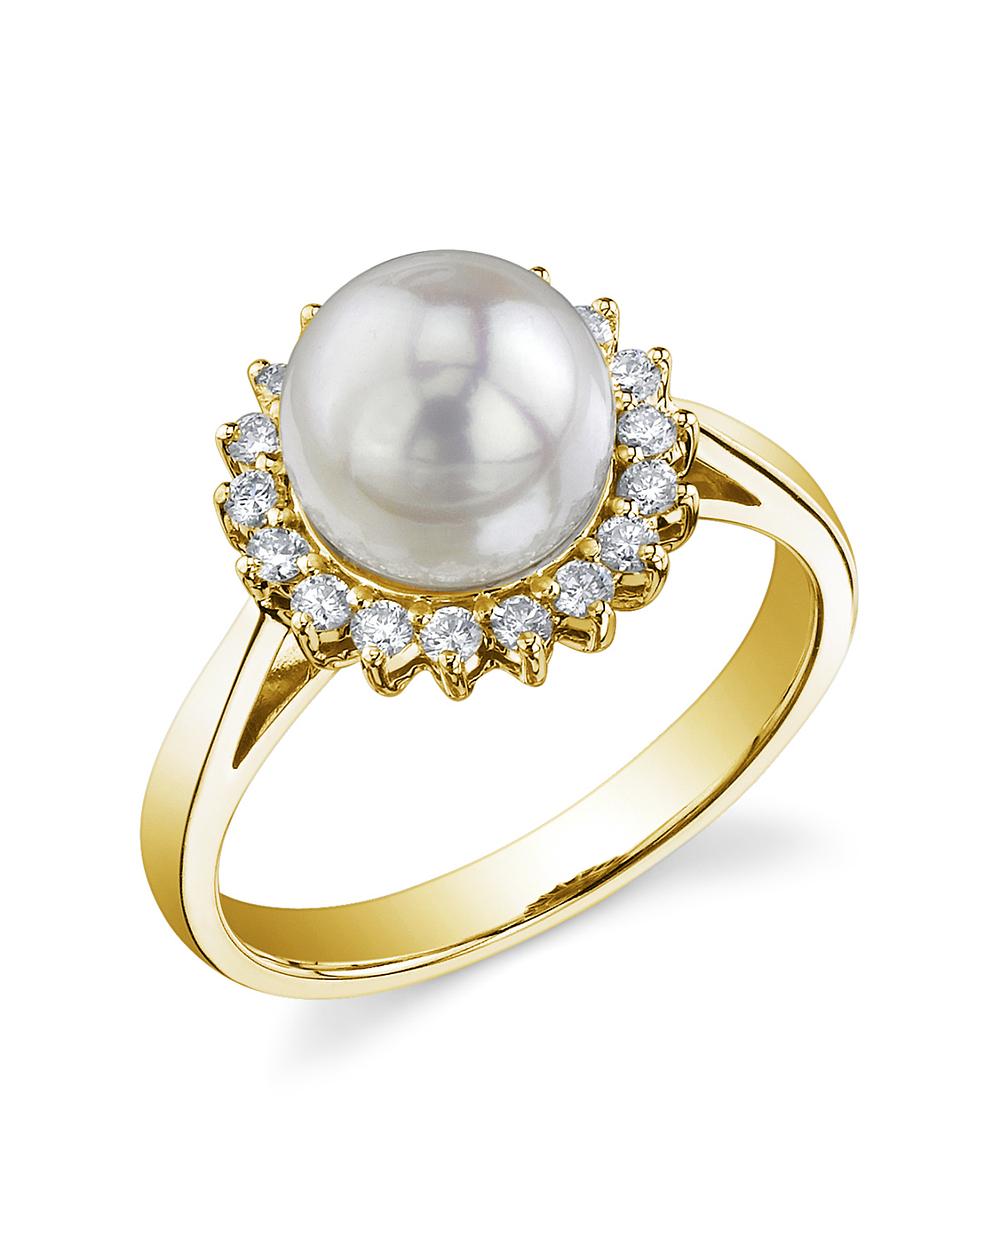 FASHION FRIDAY | Pearls - the Latest Bridal Jewelry Trend | Pretty Pear Bride